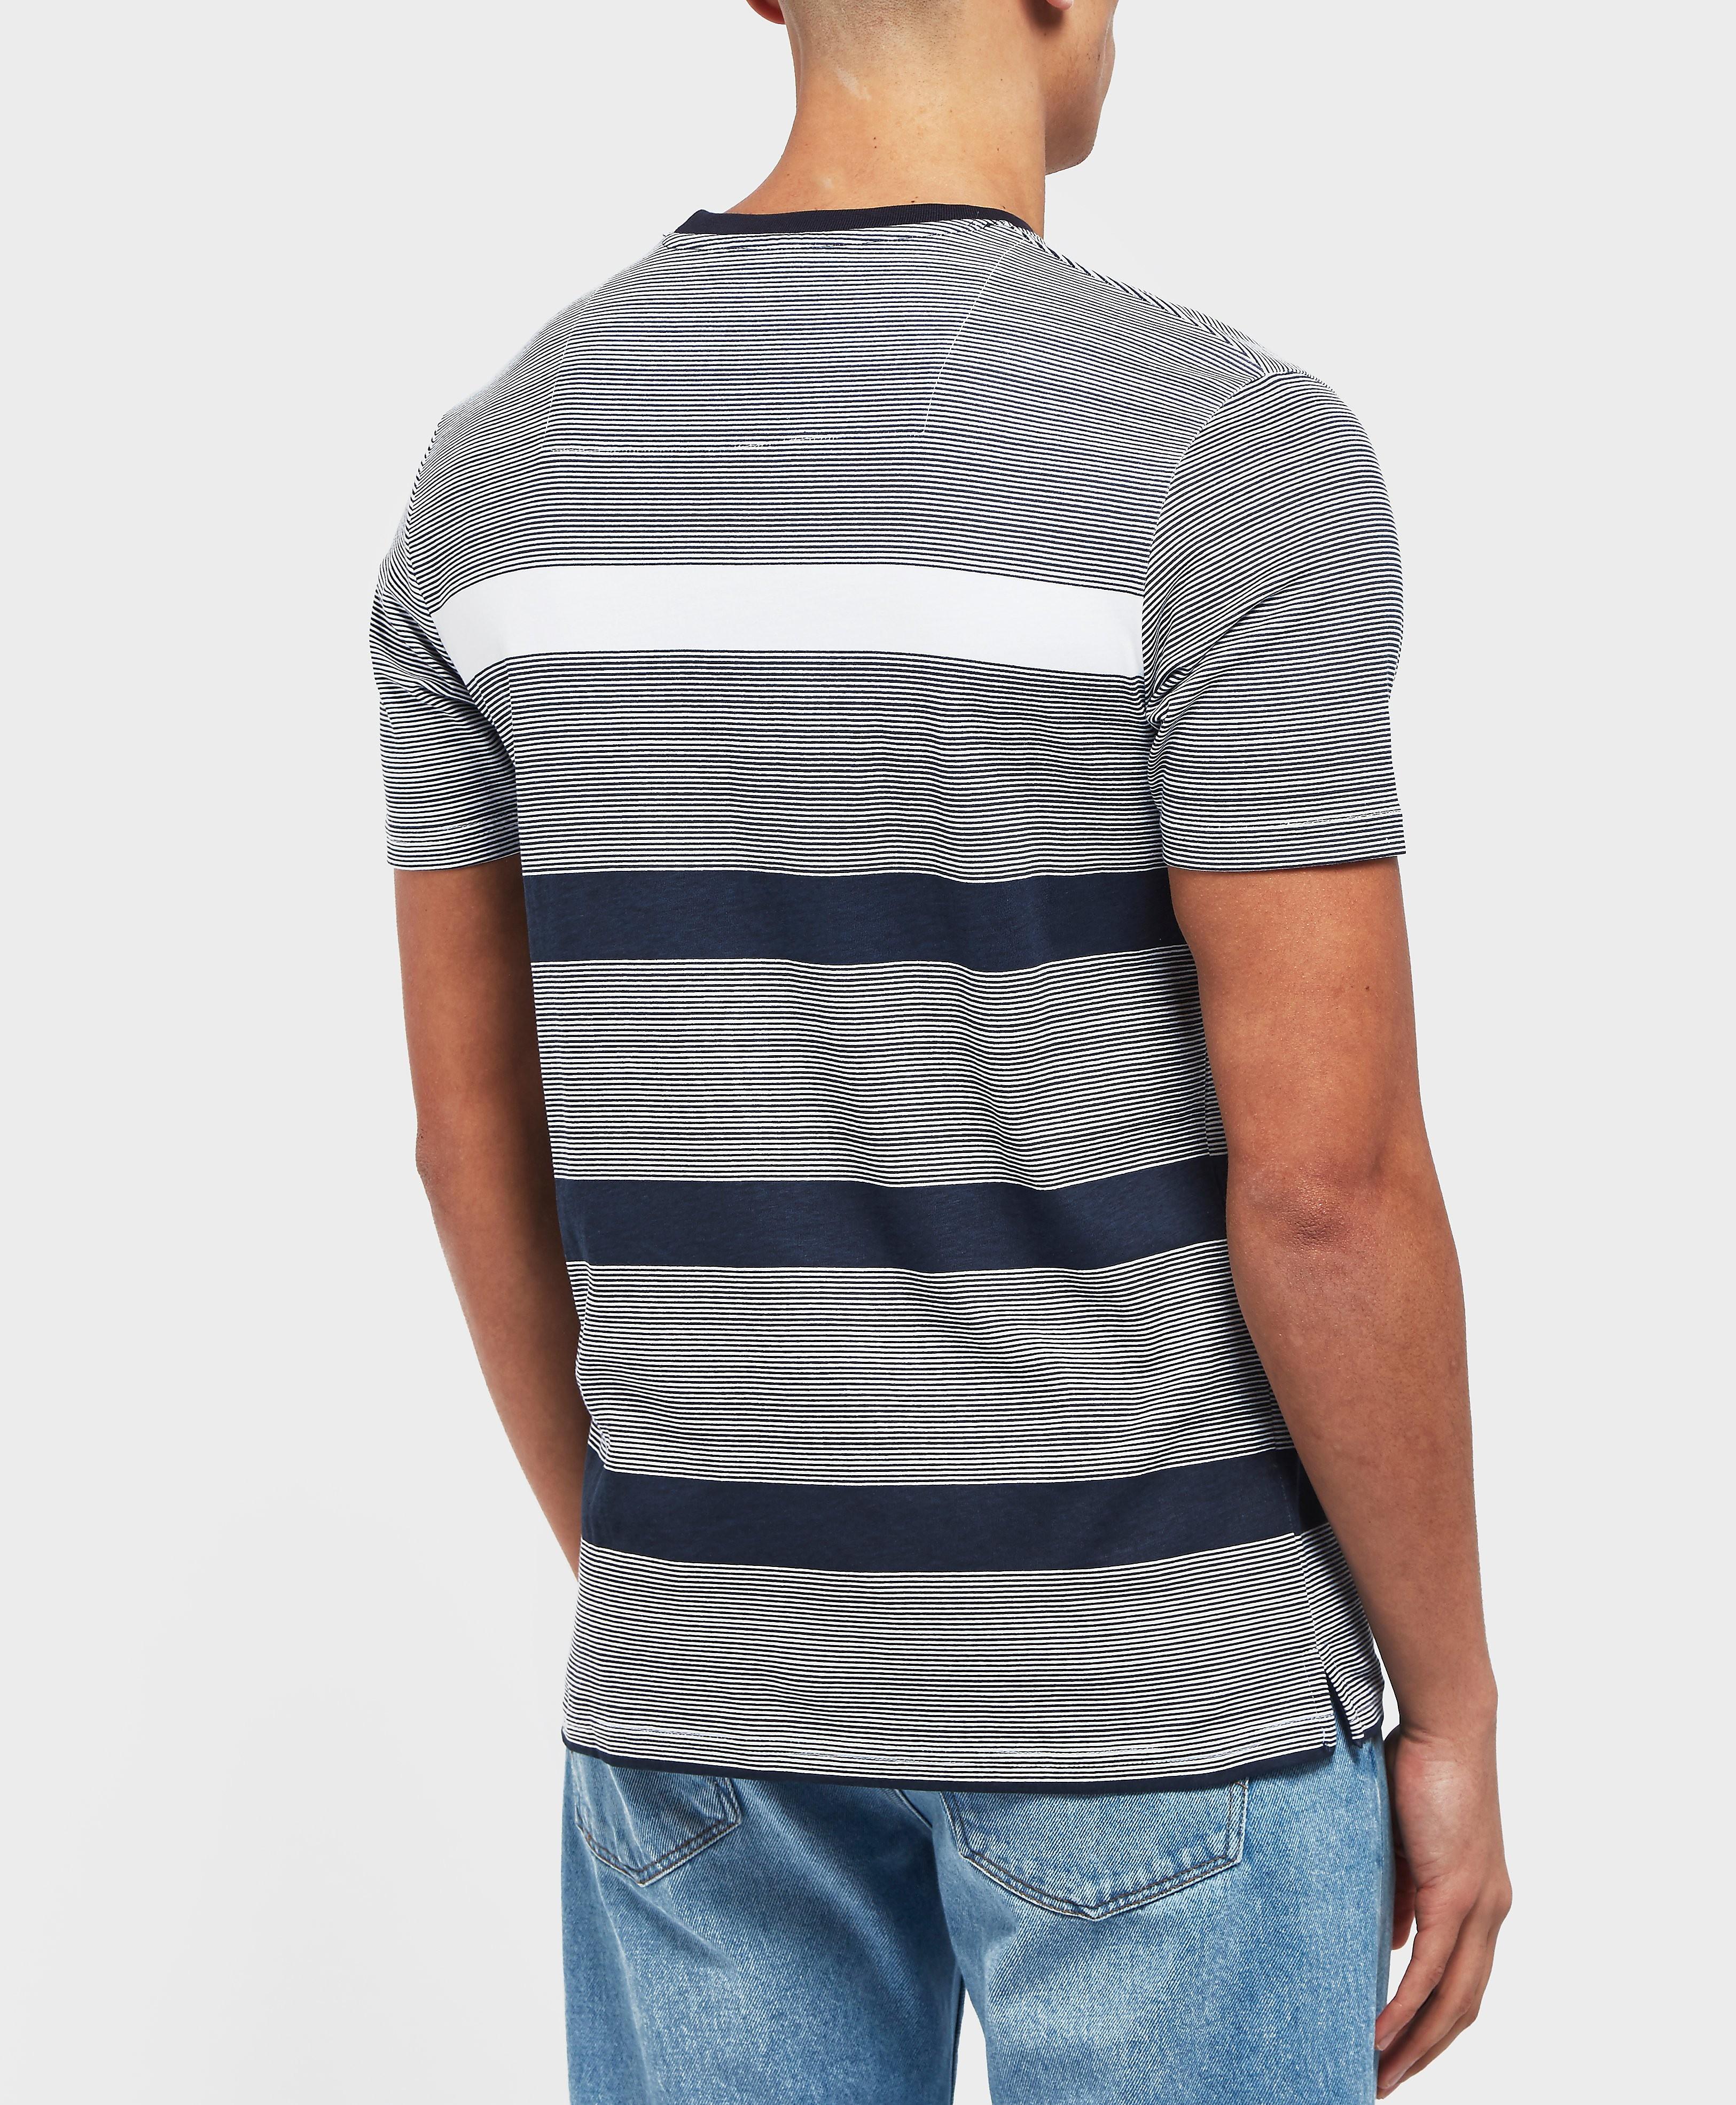 Marshall Artist Classic Stripe Short Sleeve T-Shirt